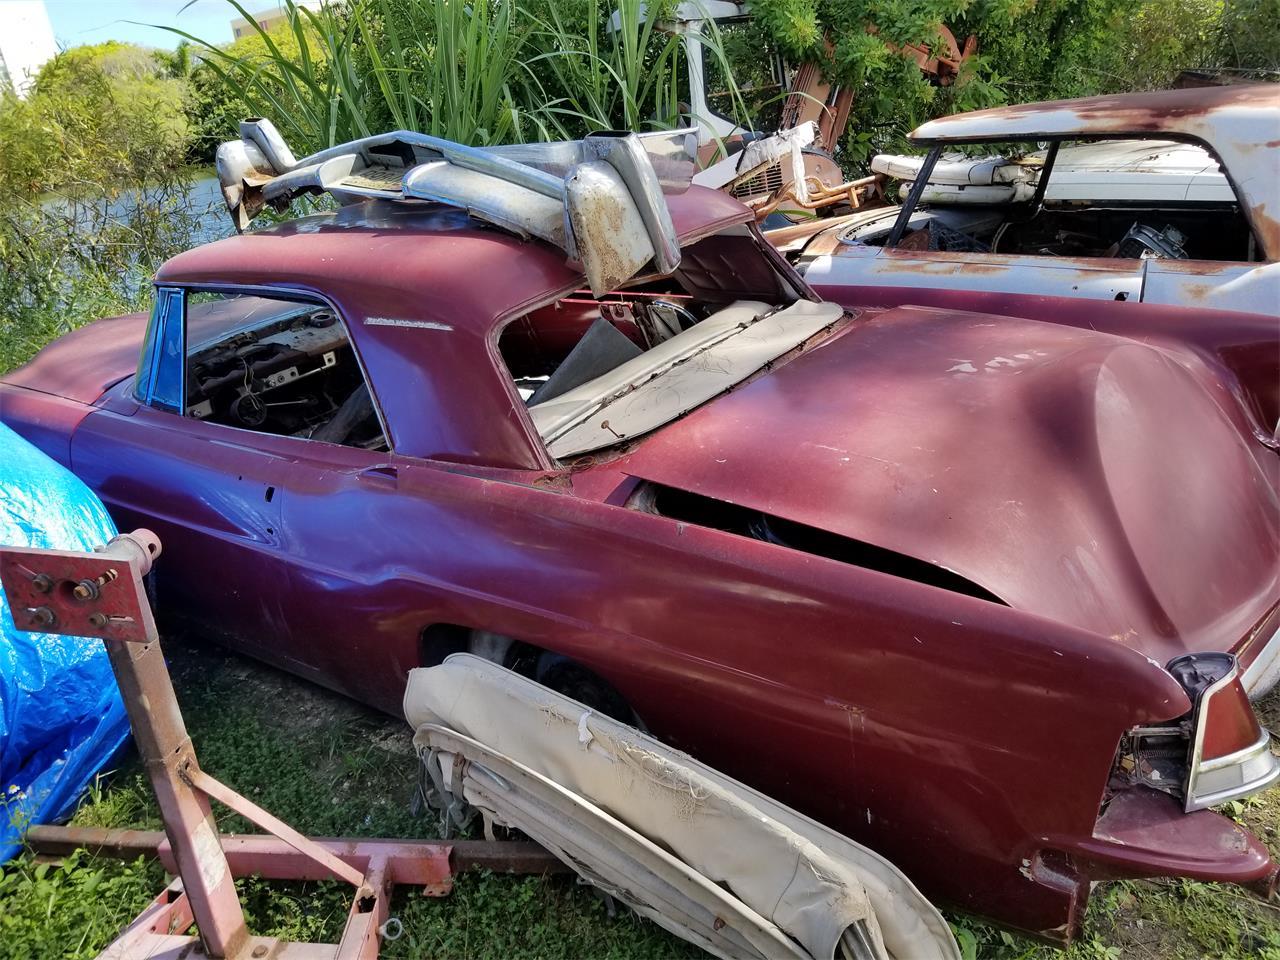 1956 Lincoln Continental Mark III (CC-1210089) for sale in BOCA RATON, Florida